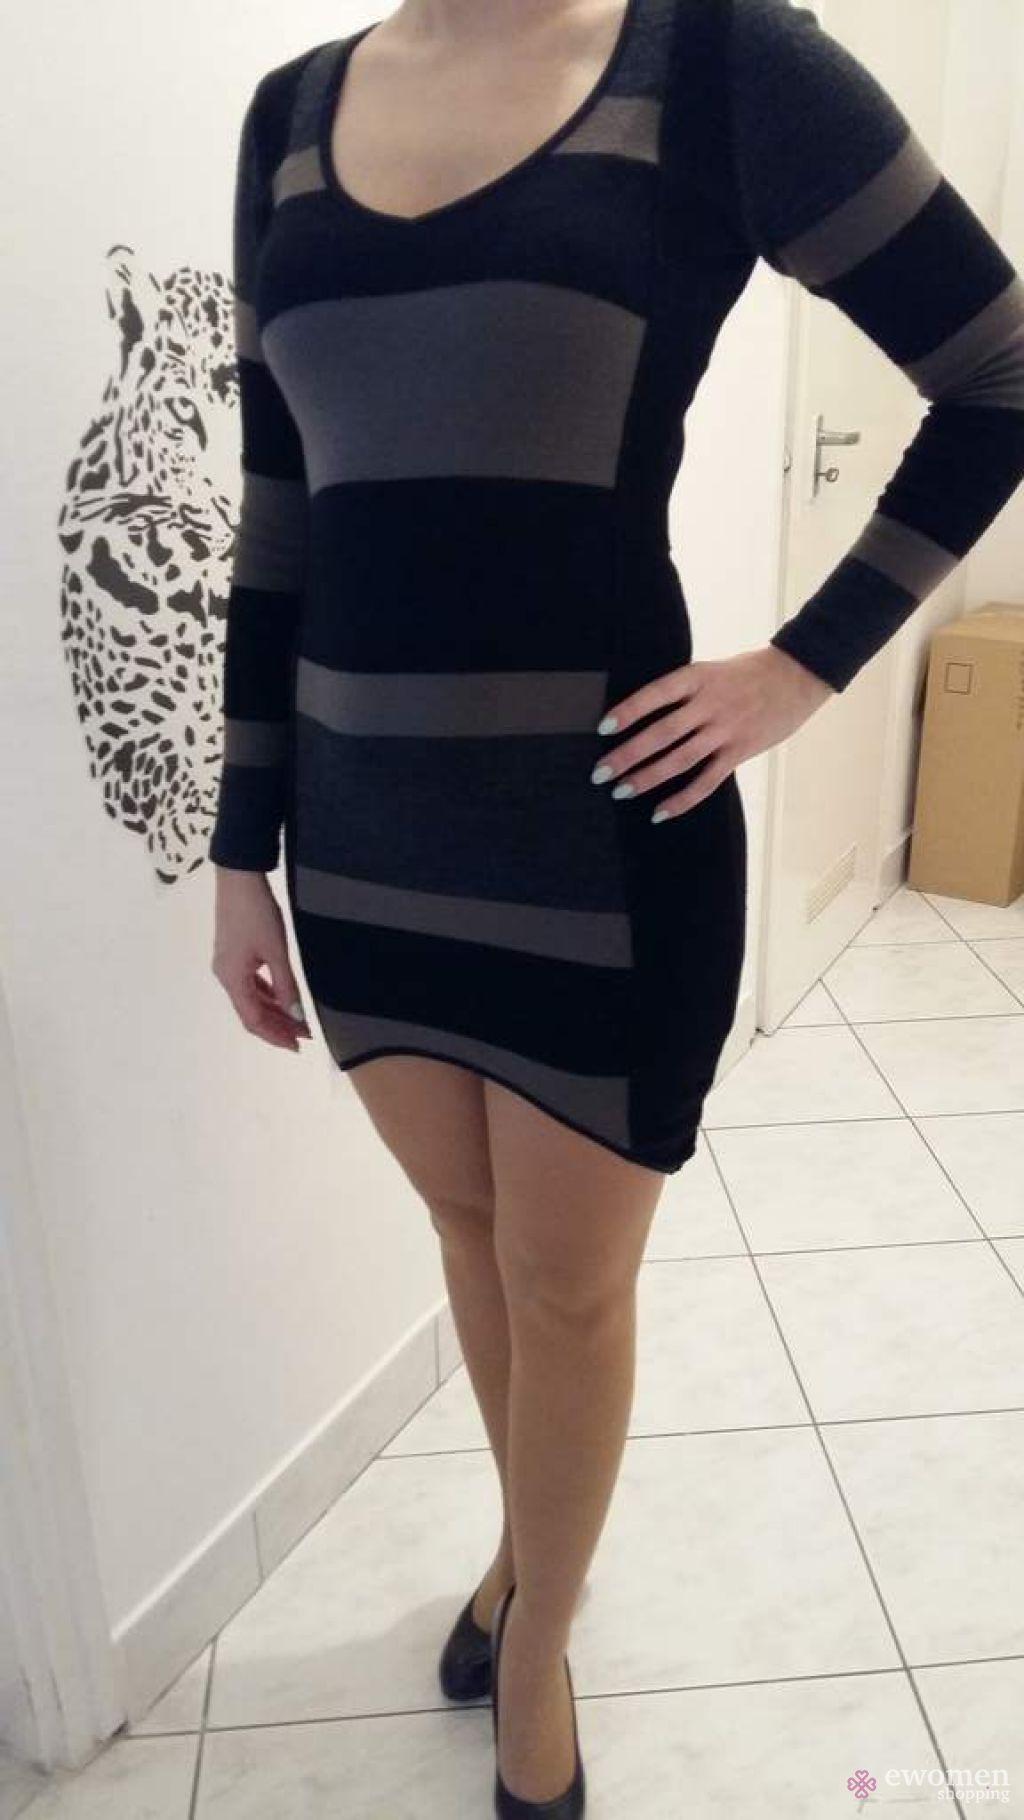 84b0766bae Sowengo neonpink overál/ overall (my77 hasonlít) - eWomen Shopping